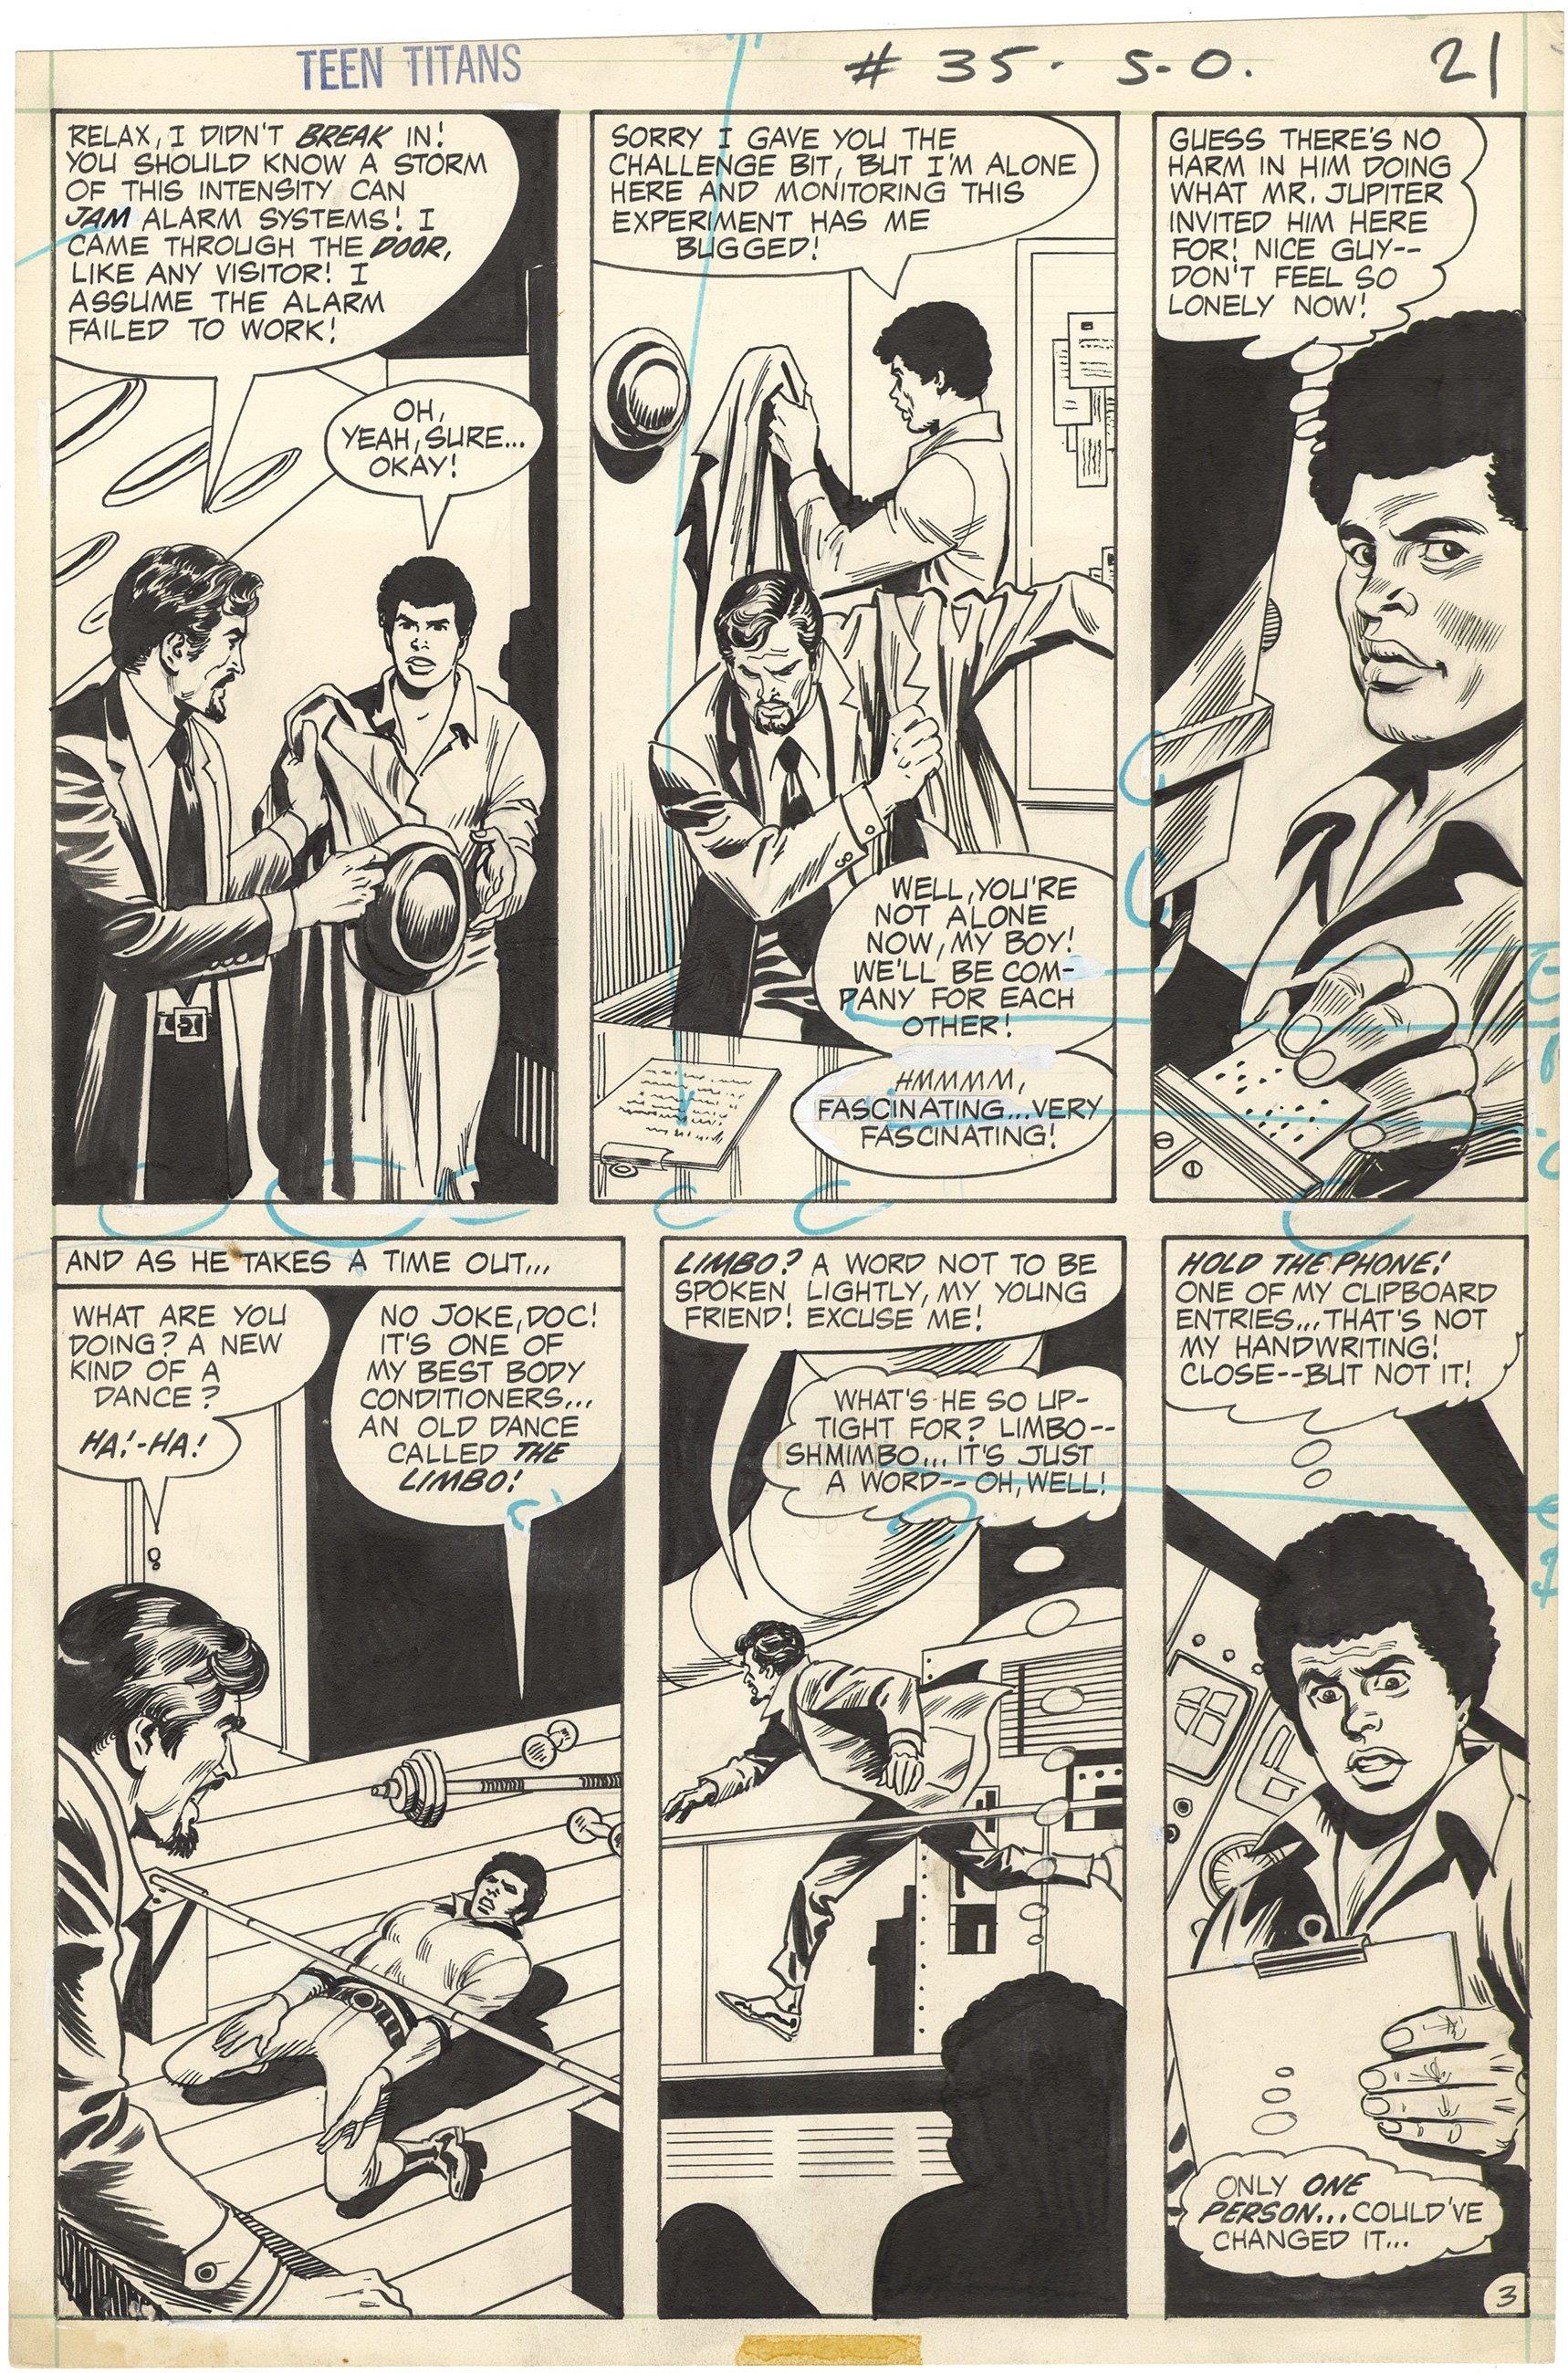 Teen Titans #35 p3